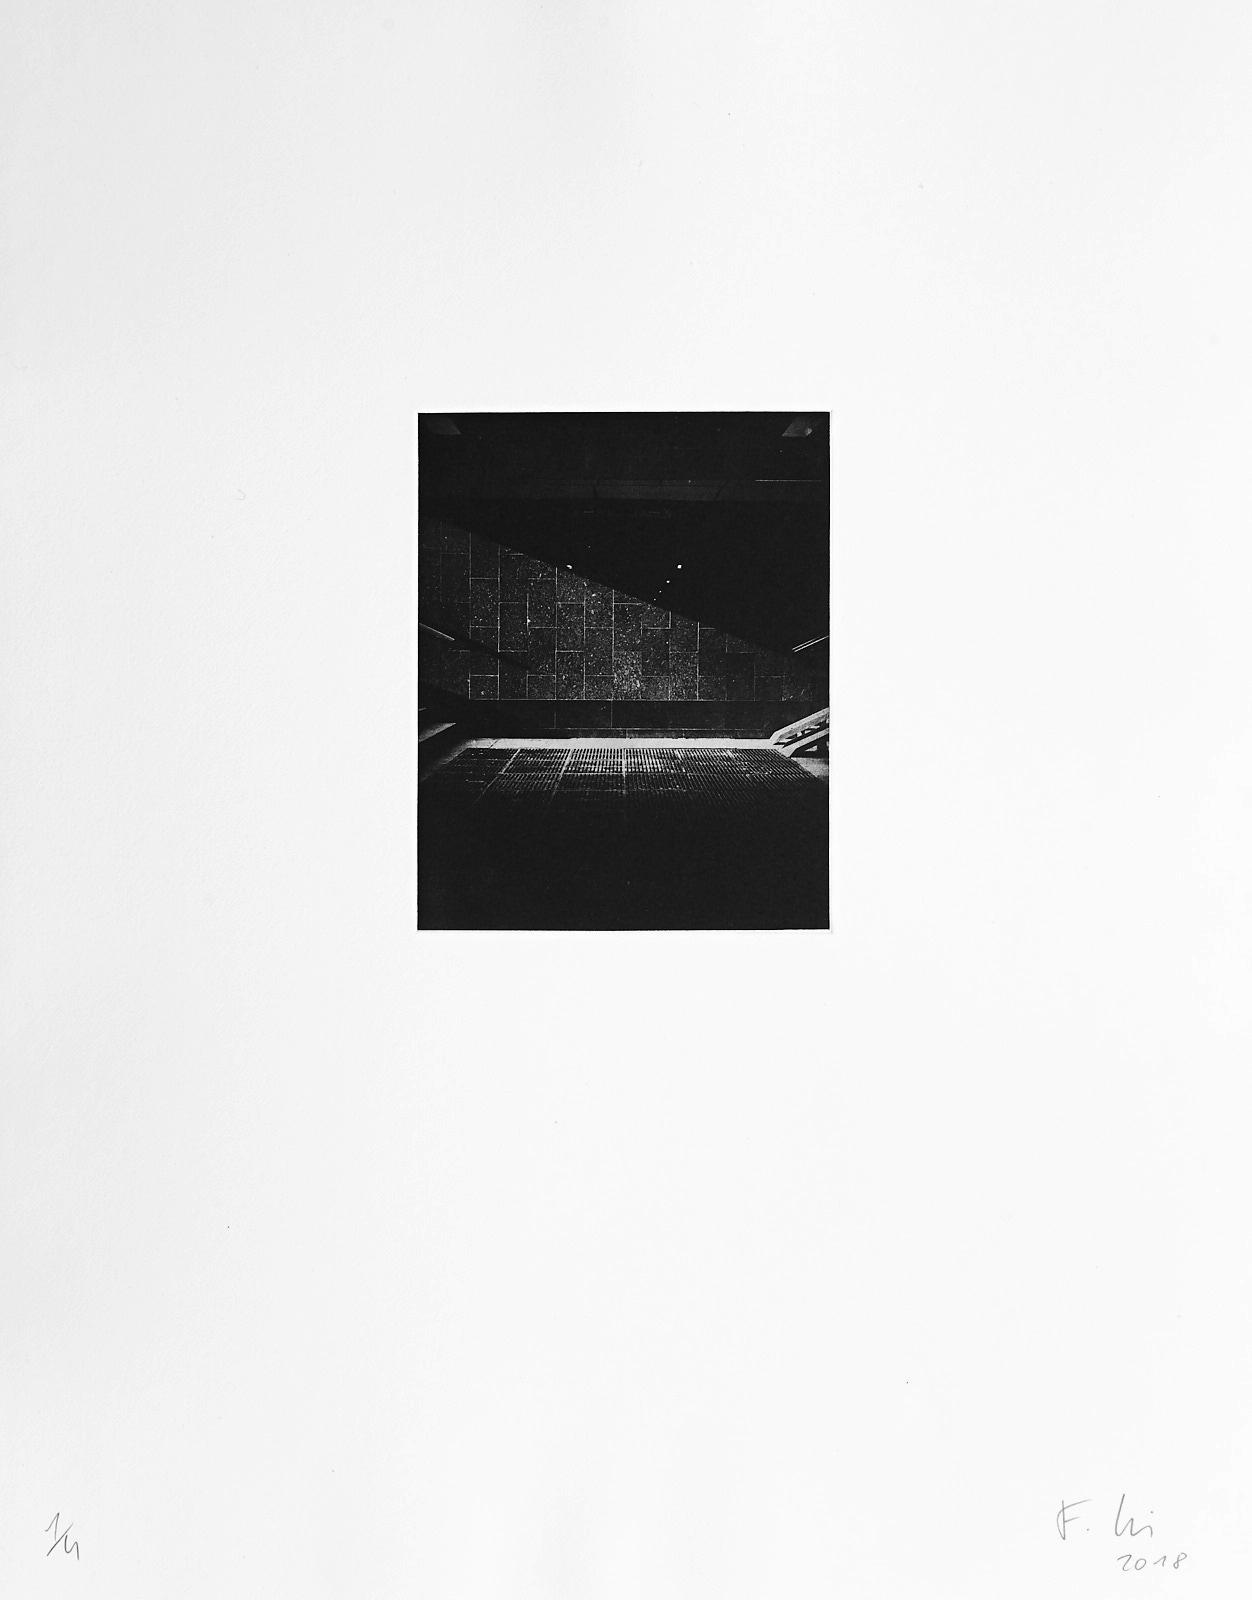 o.T.[Typologien#8]  (2018)  medium: Photogravure  size: 36 x 46 cm  paper: Zerkall 270 g/qm  plate: 11.7 x 14.7 cm  edition: 6 copies  numbered: 1/4 - 4/4, 2 e.a.  printer: FWU